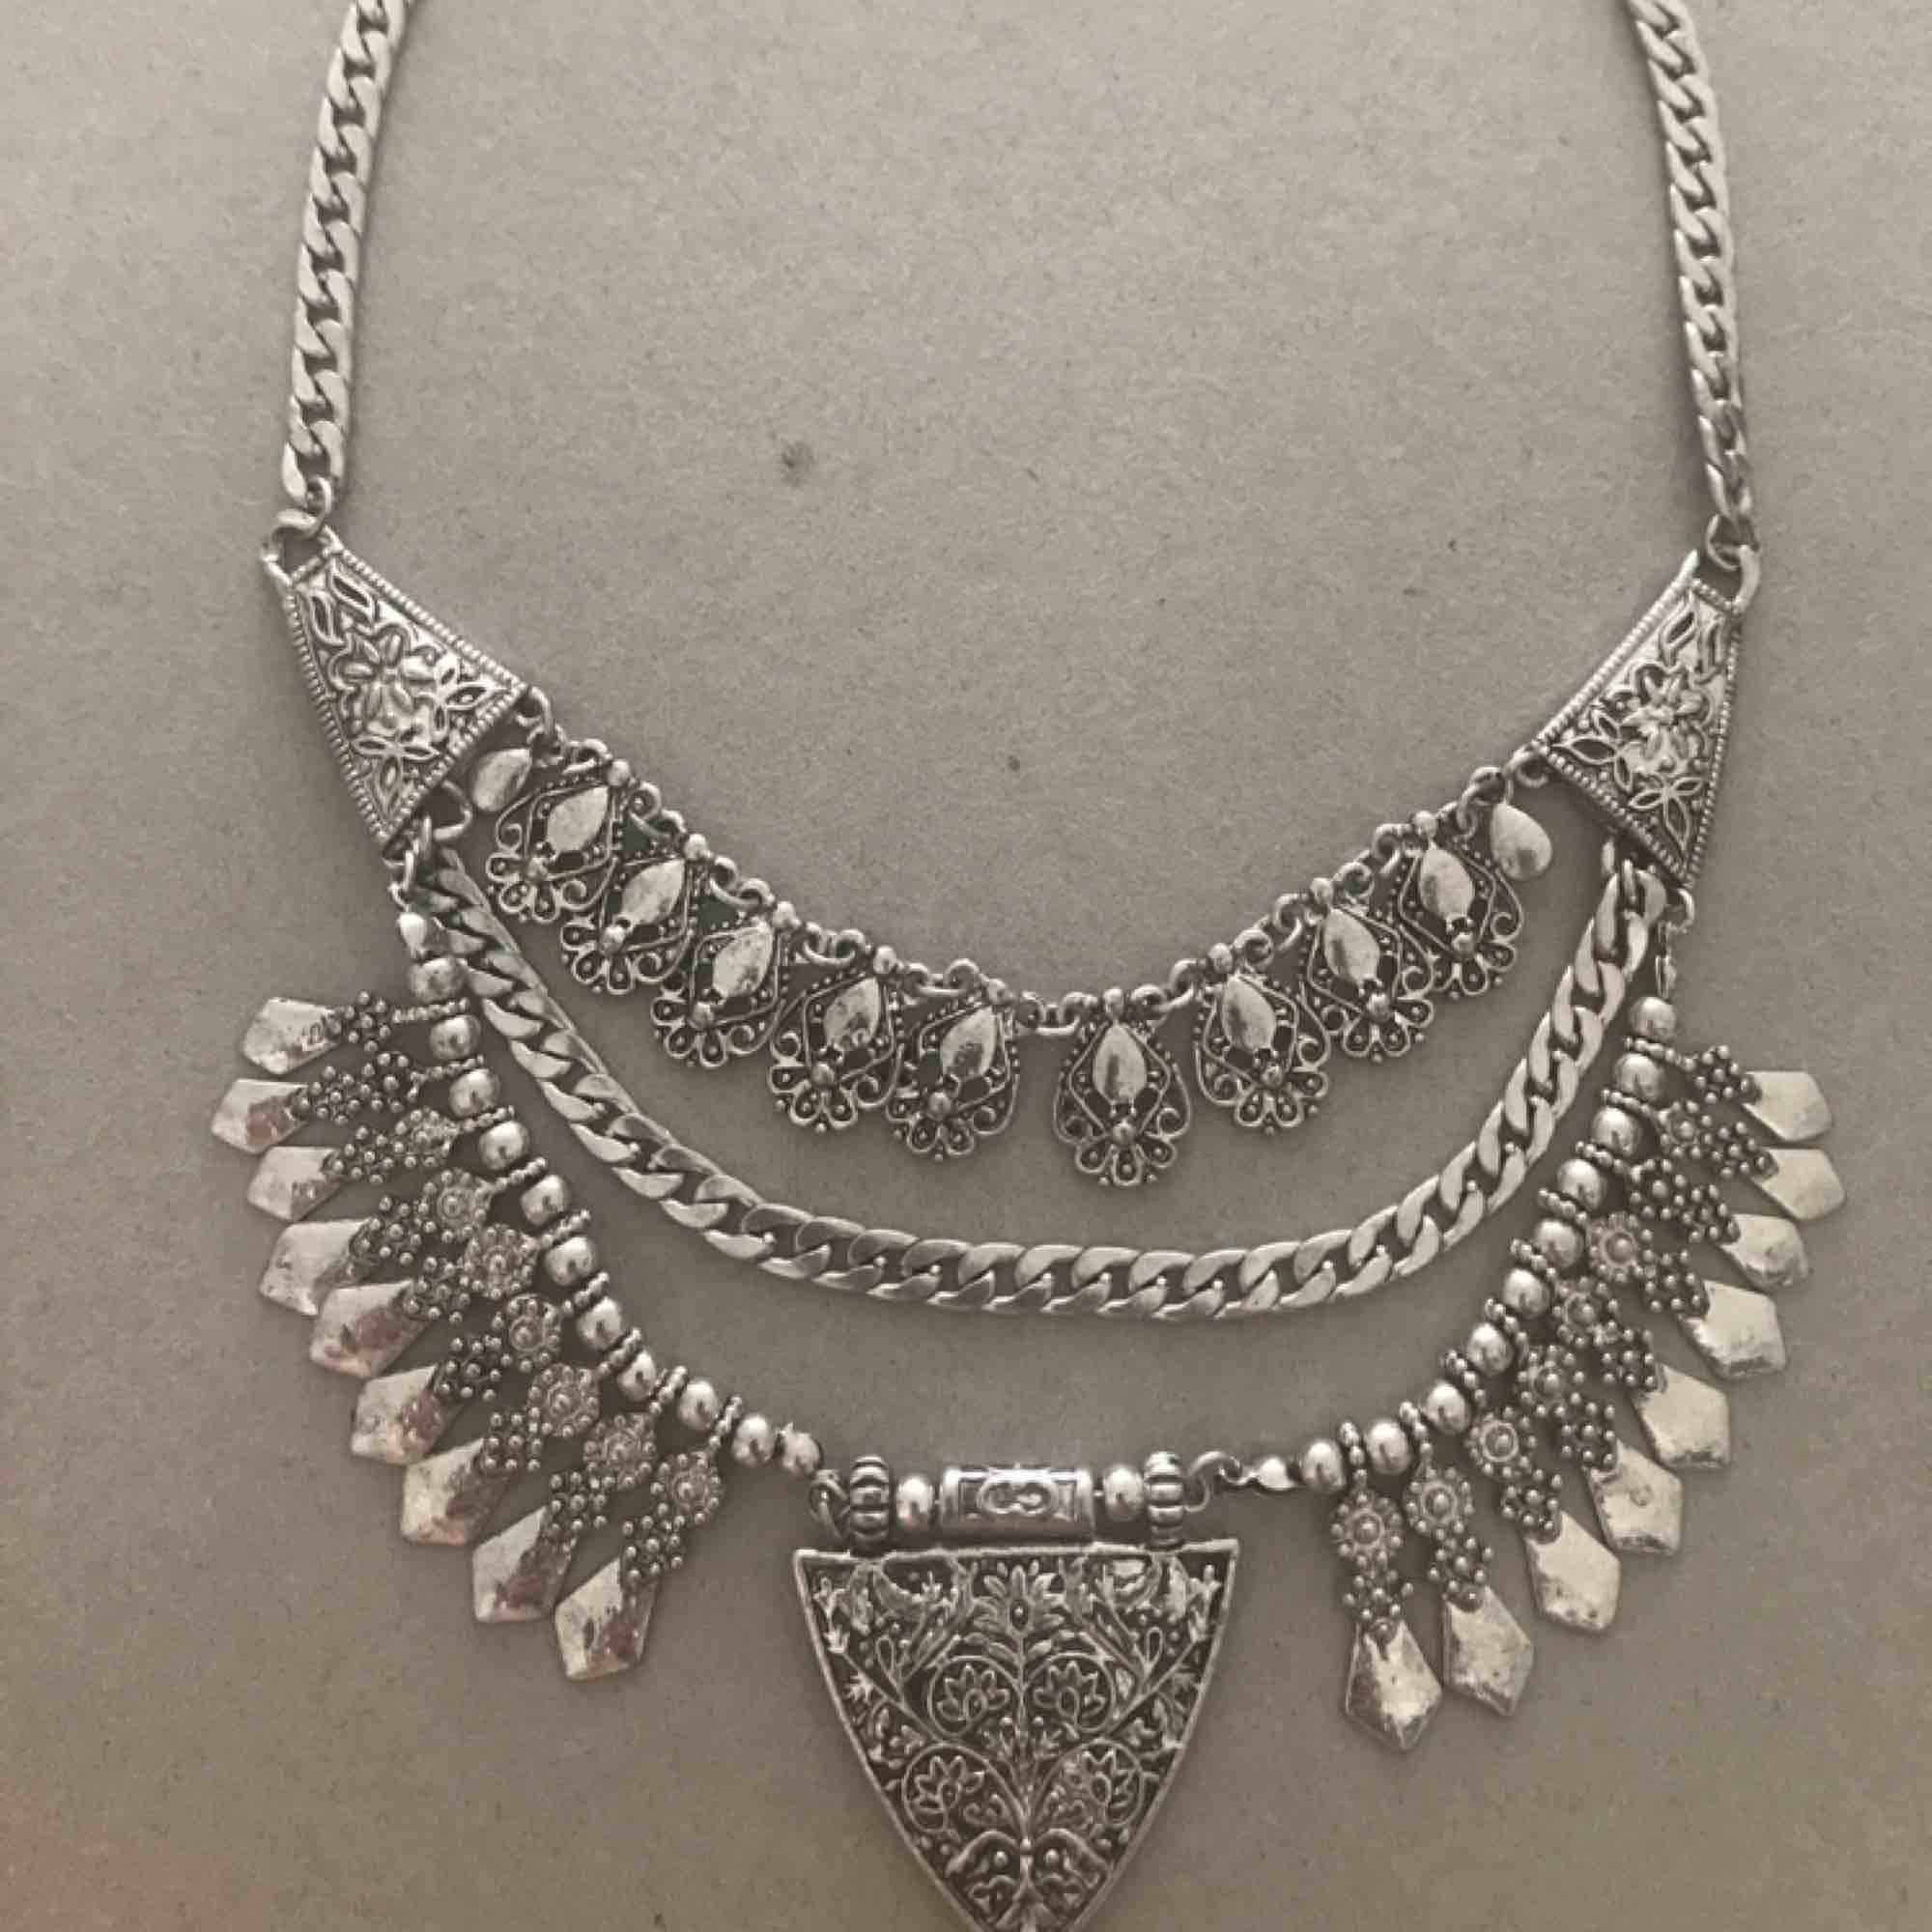 Fint bohemiskt halsband. Accessoarer.